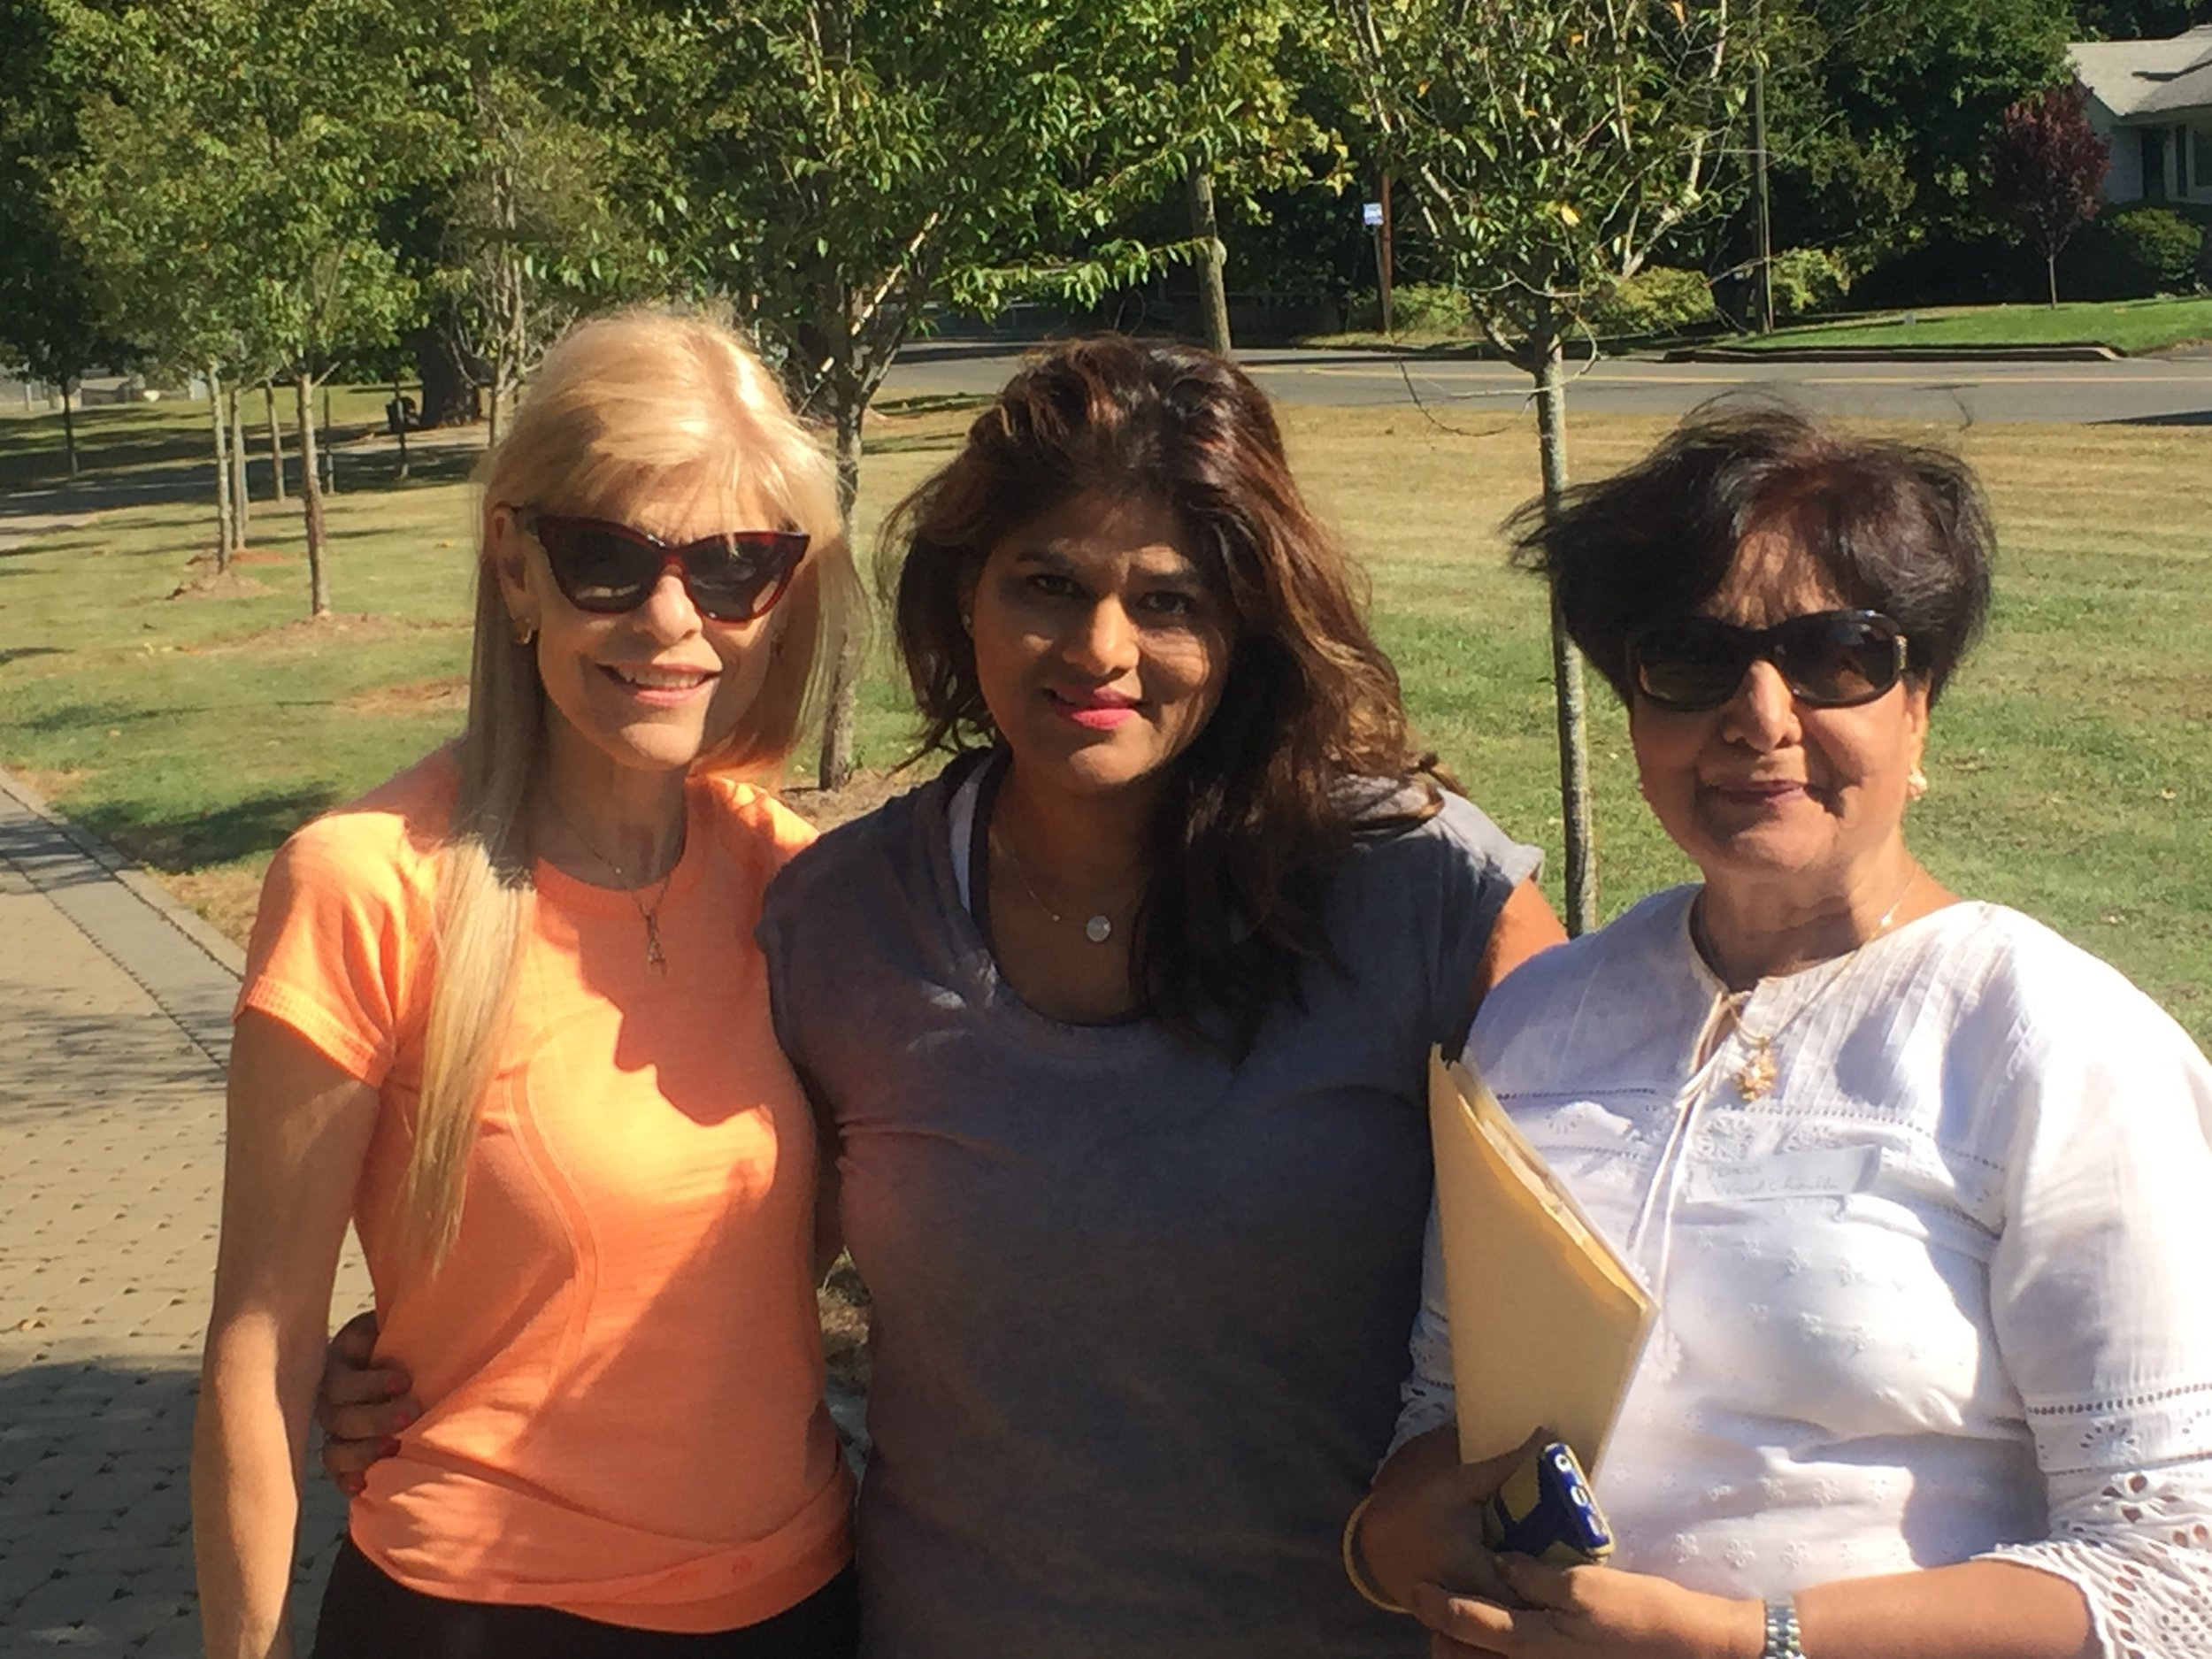 fundraising walk-a-thon